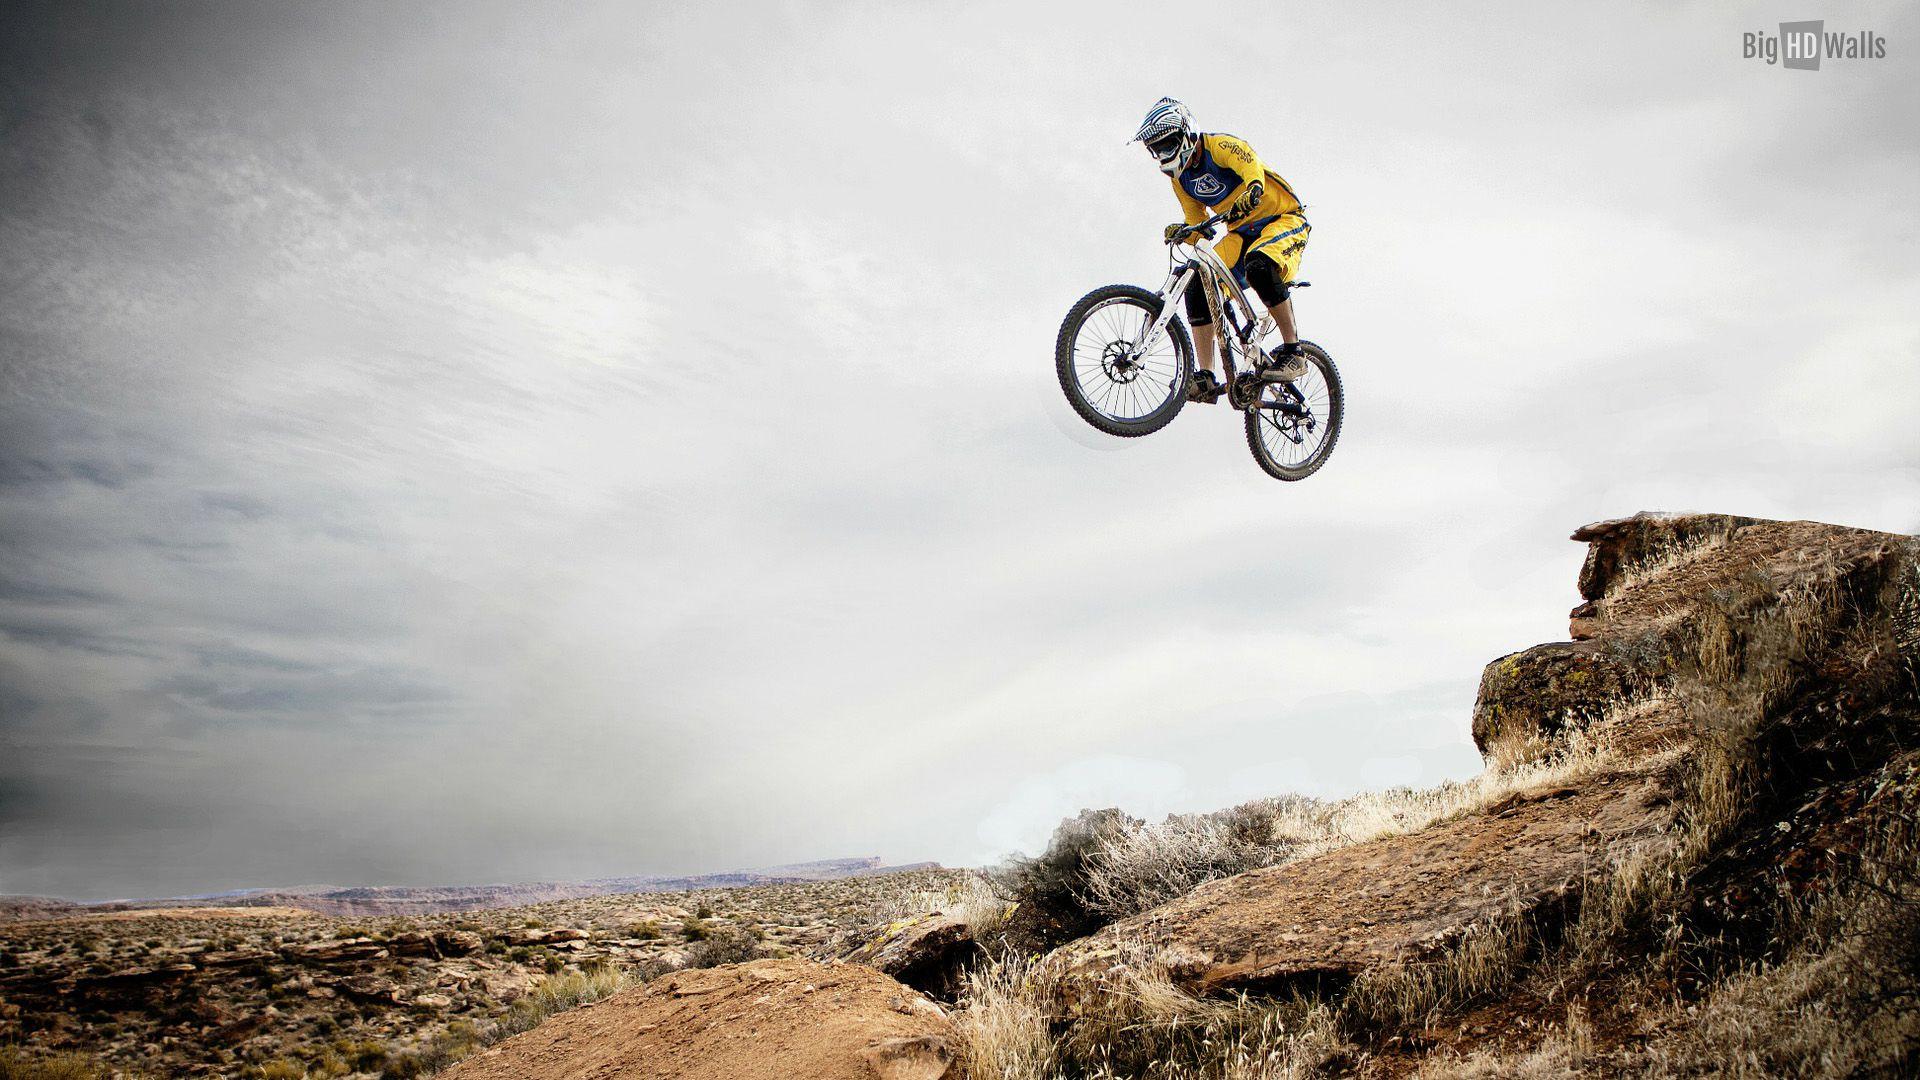 Downhill Mountain Biking Big Air